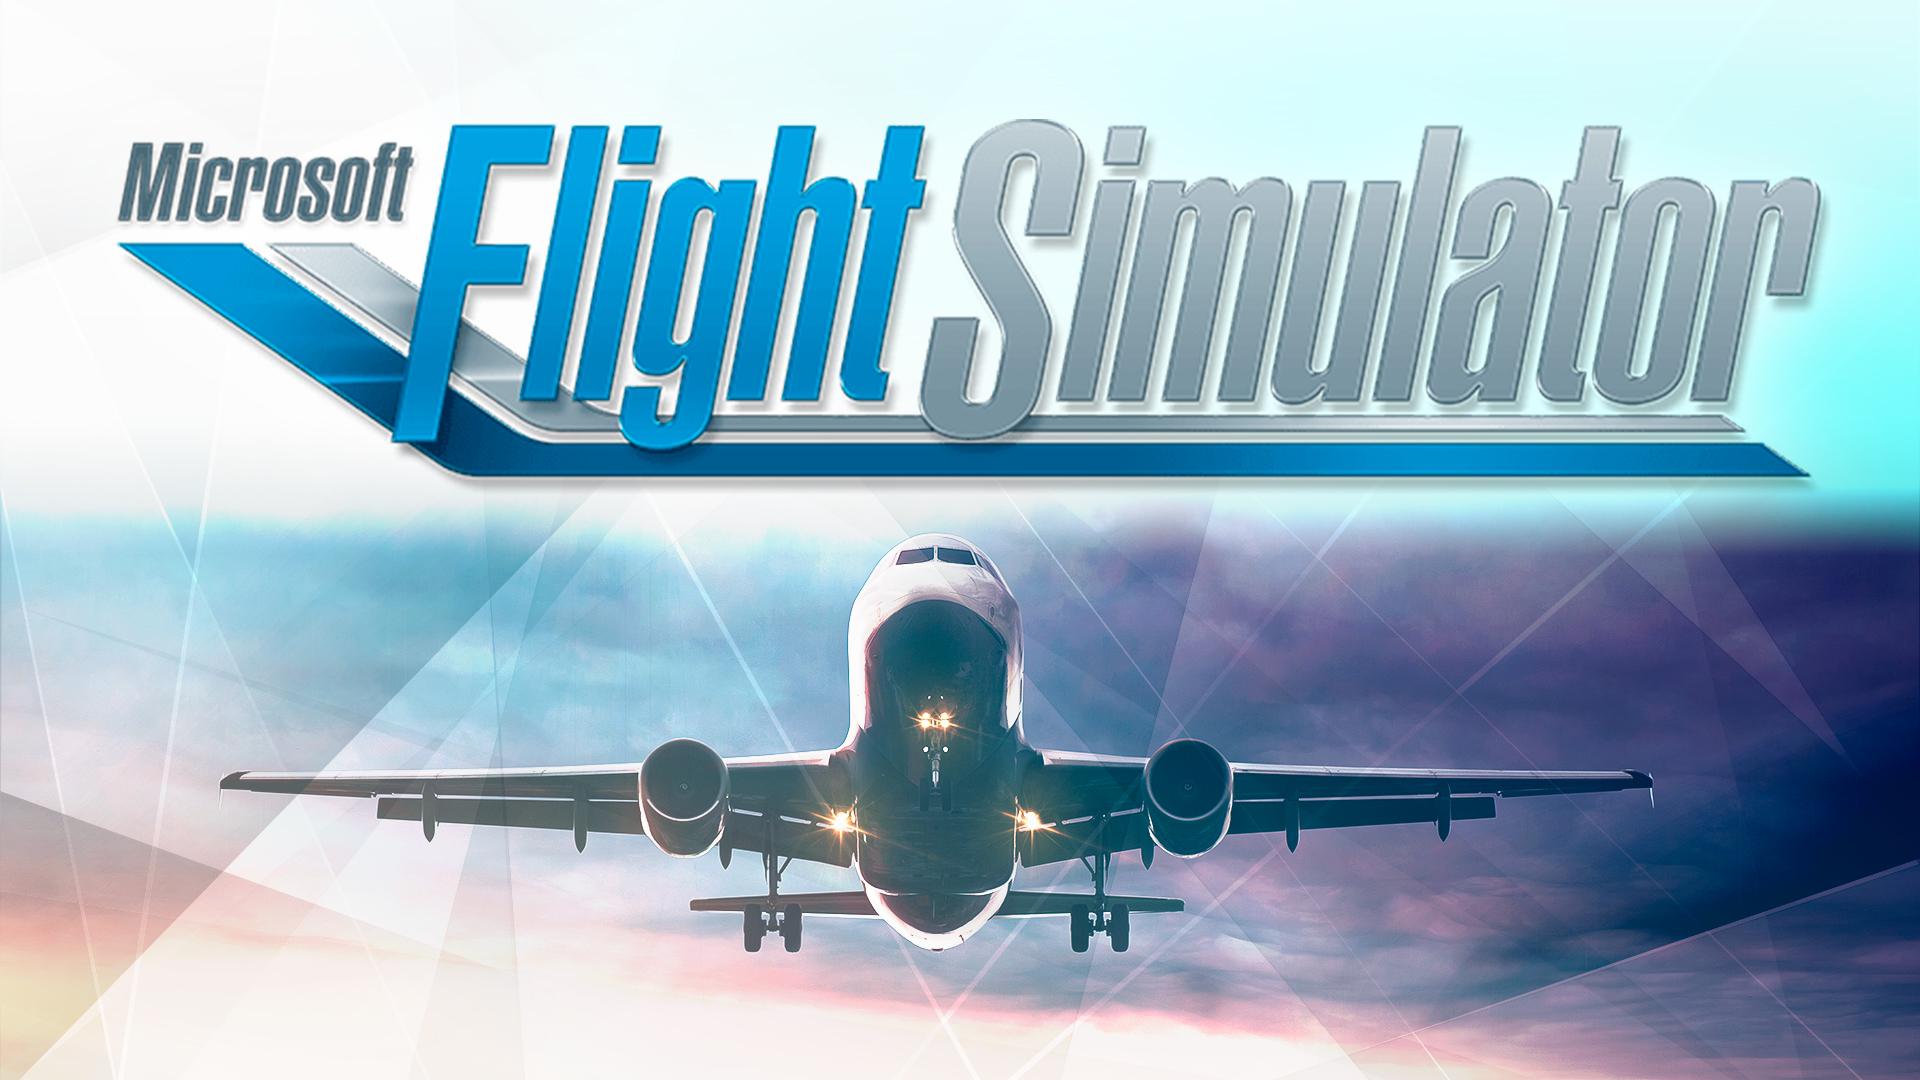 Logo, Flugzeug, flugsimulation, Flight Simulator, Flight Simulator 2020, Microsoft Flight Simulator, Flugsimulator, Microsoft Flight Simulator 2020, FlightSim, Microsoft Flugsimulator Update, Microsoft Flight Simulator Update, FS, MSFT FS, Jet